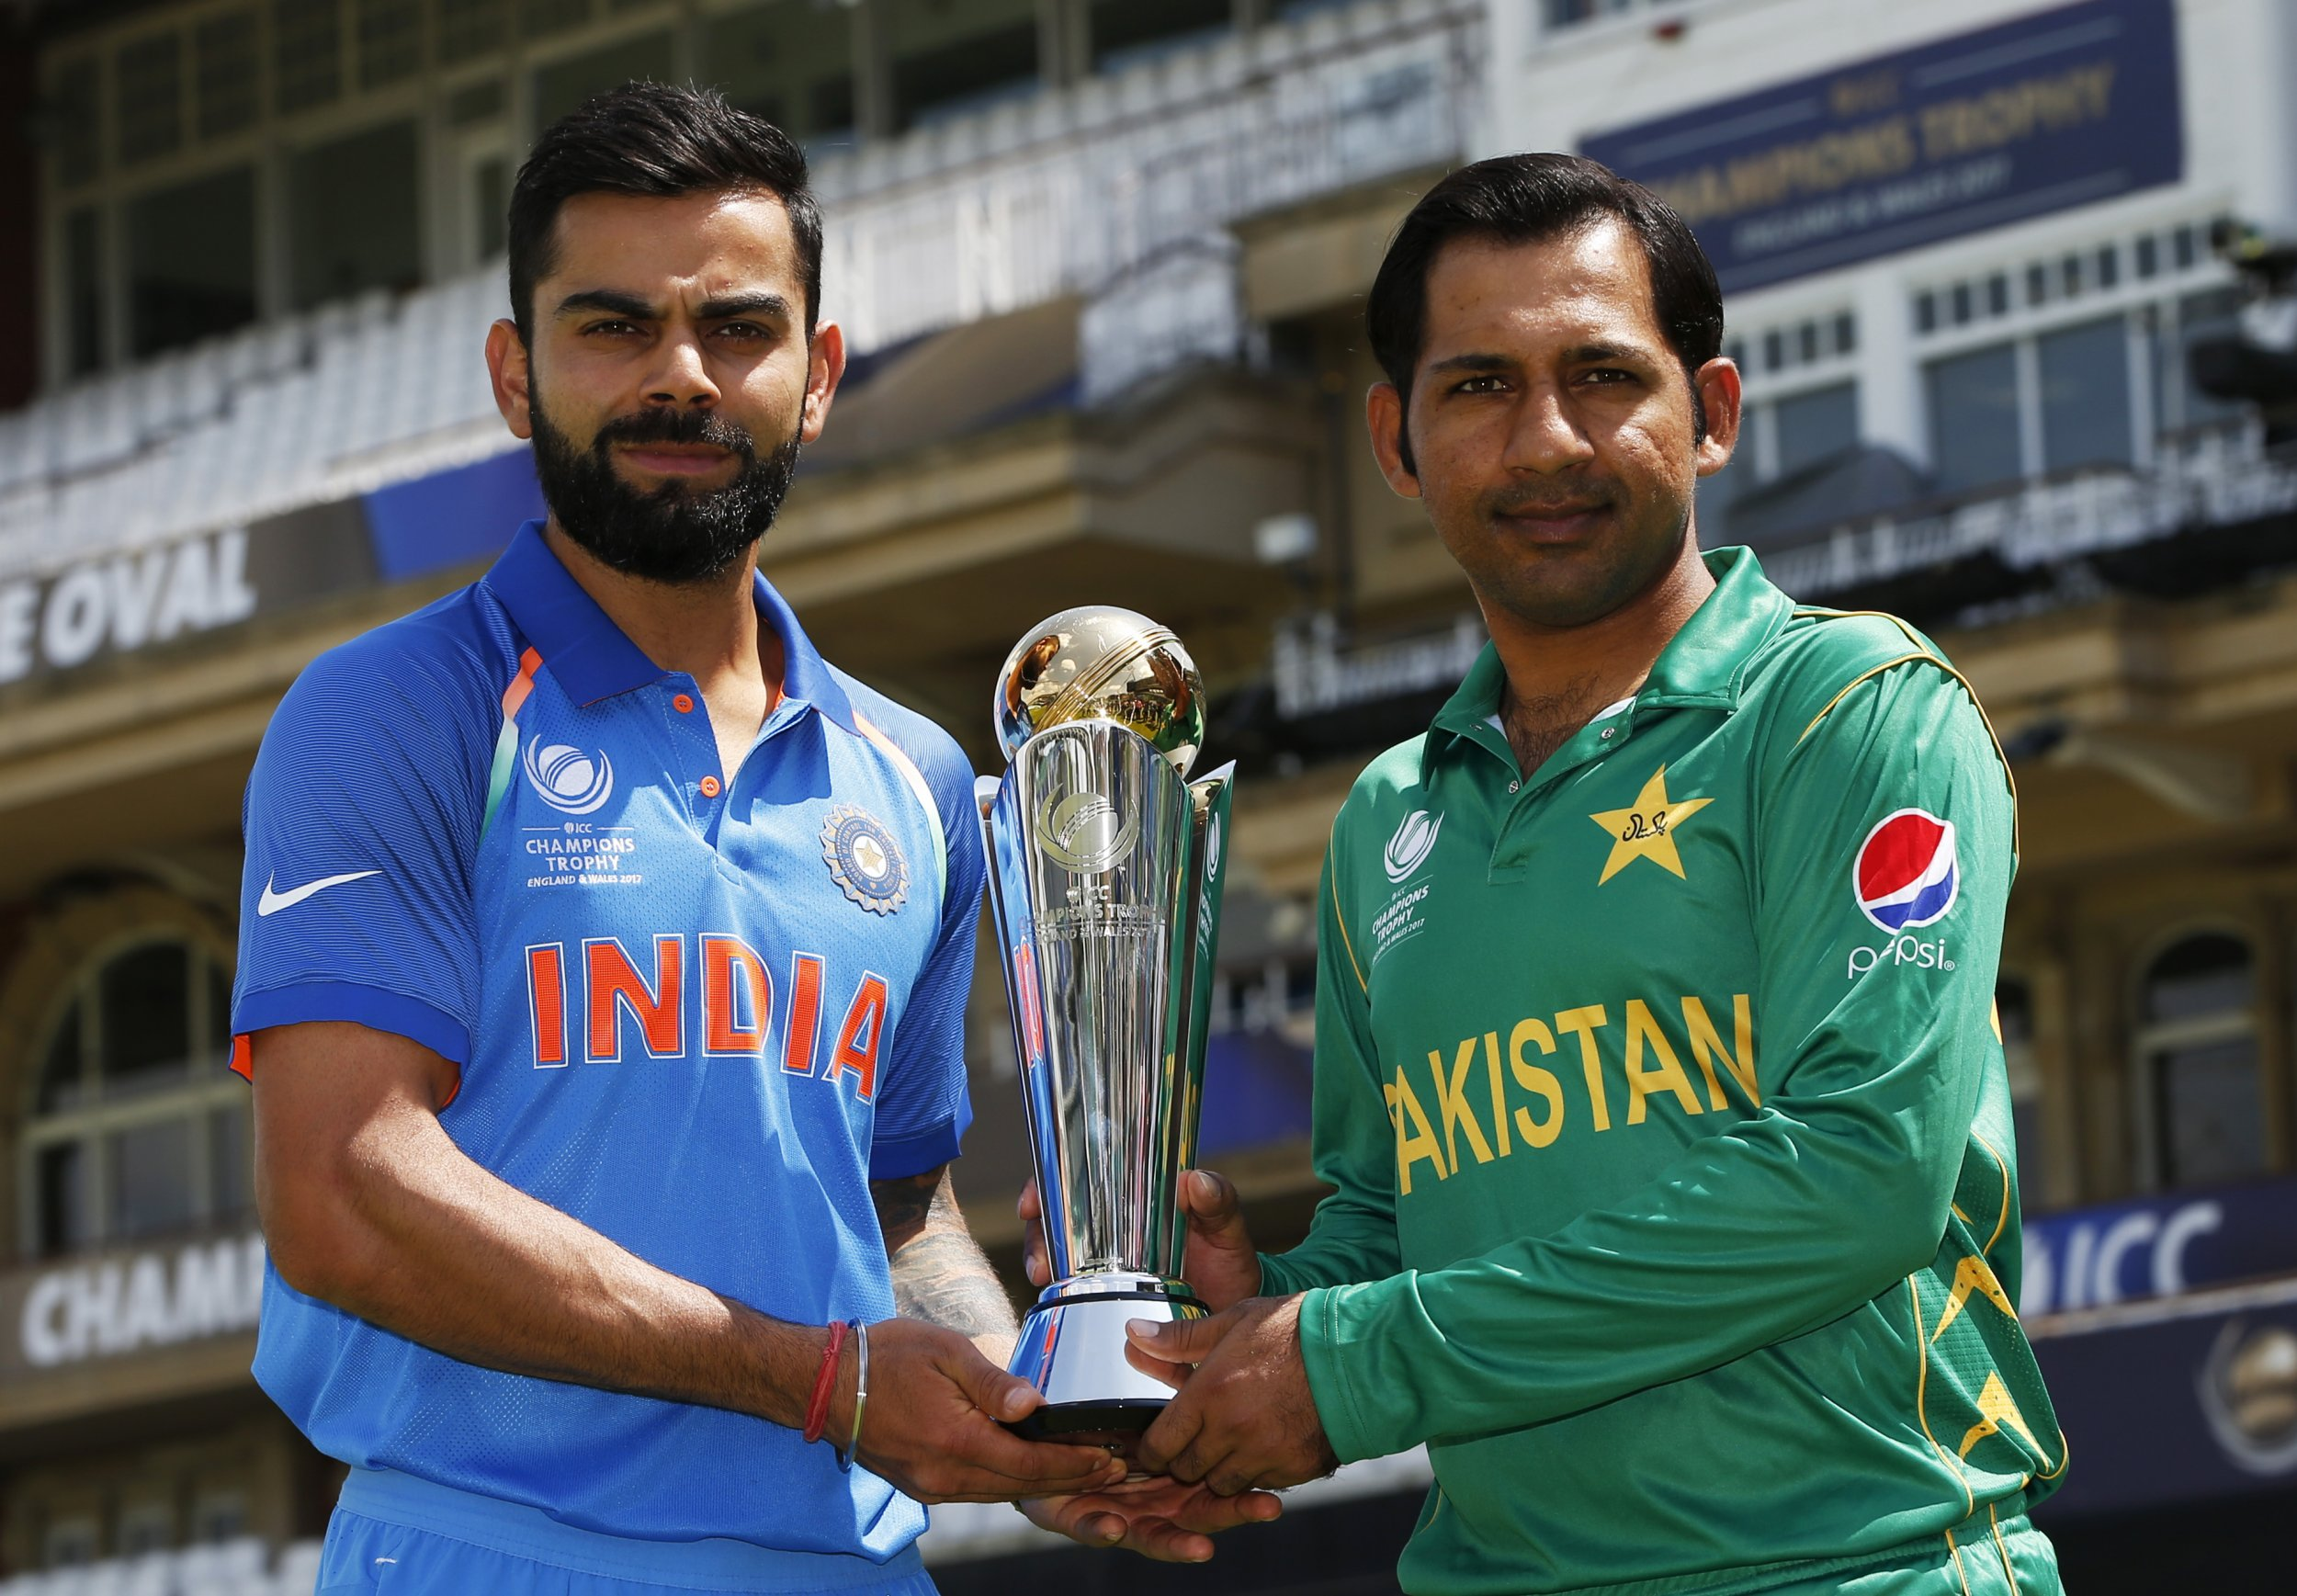 india vs pakistan live